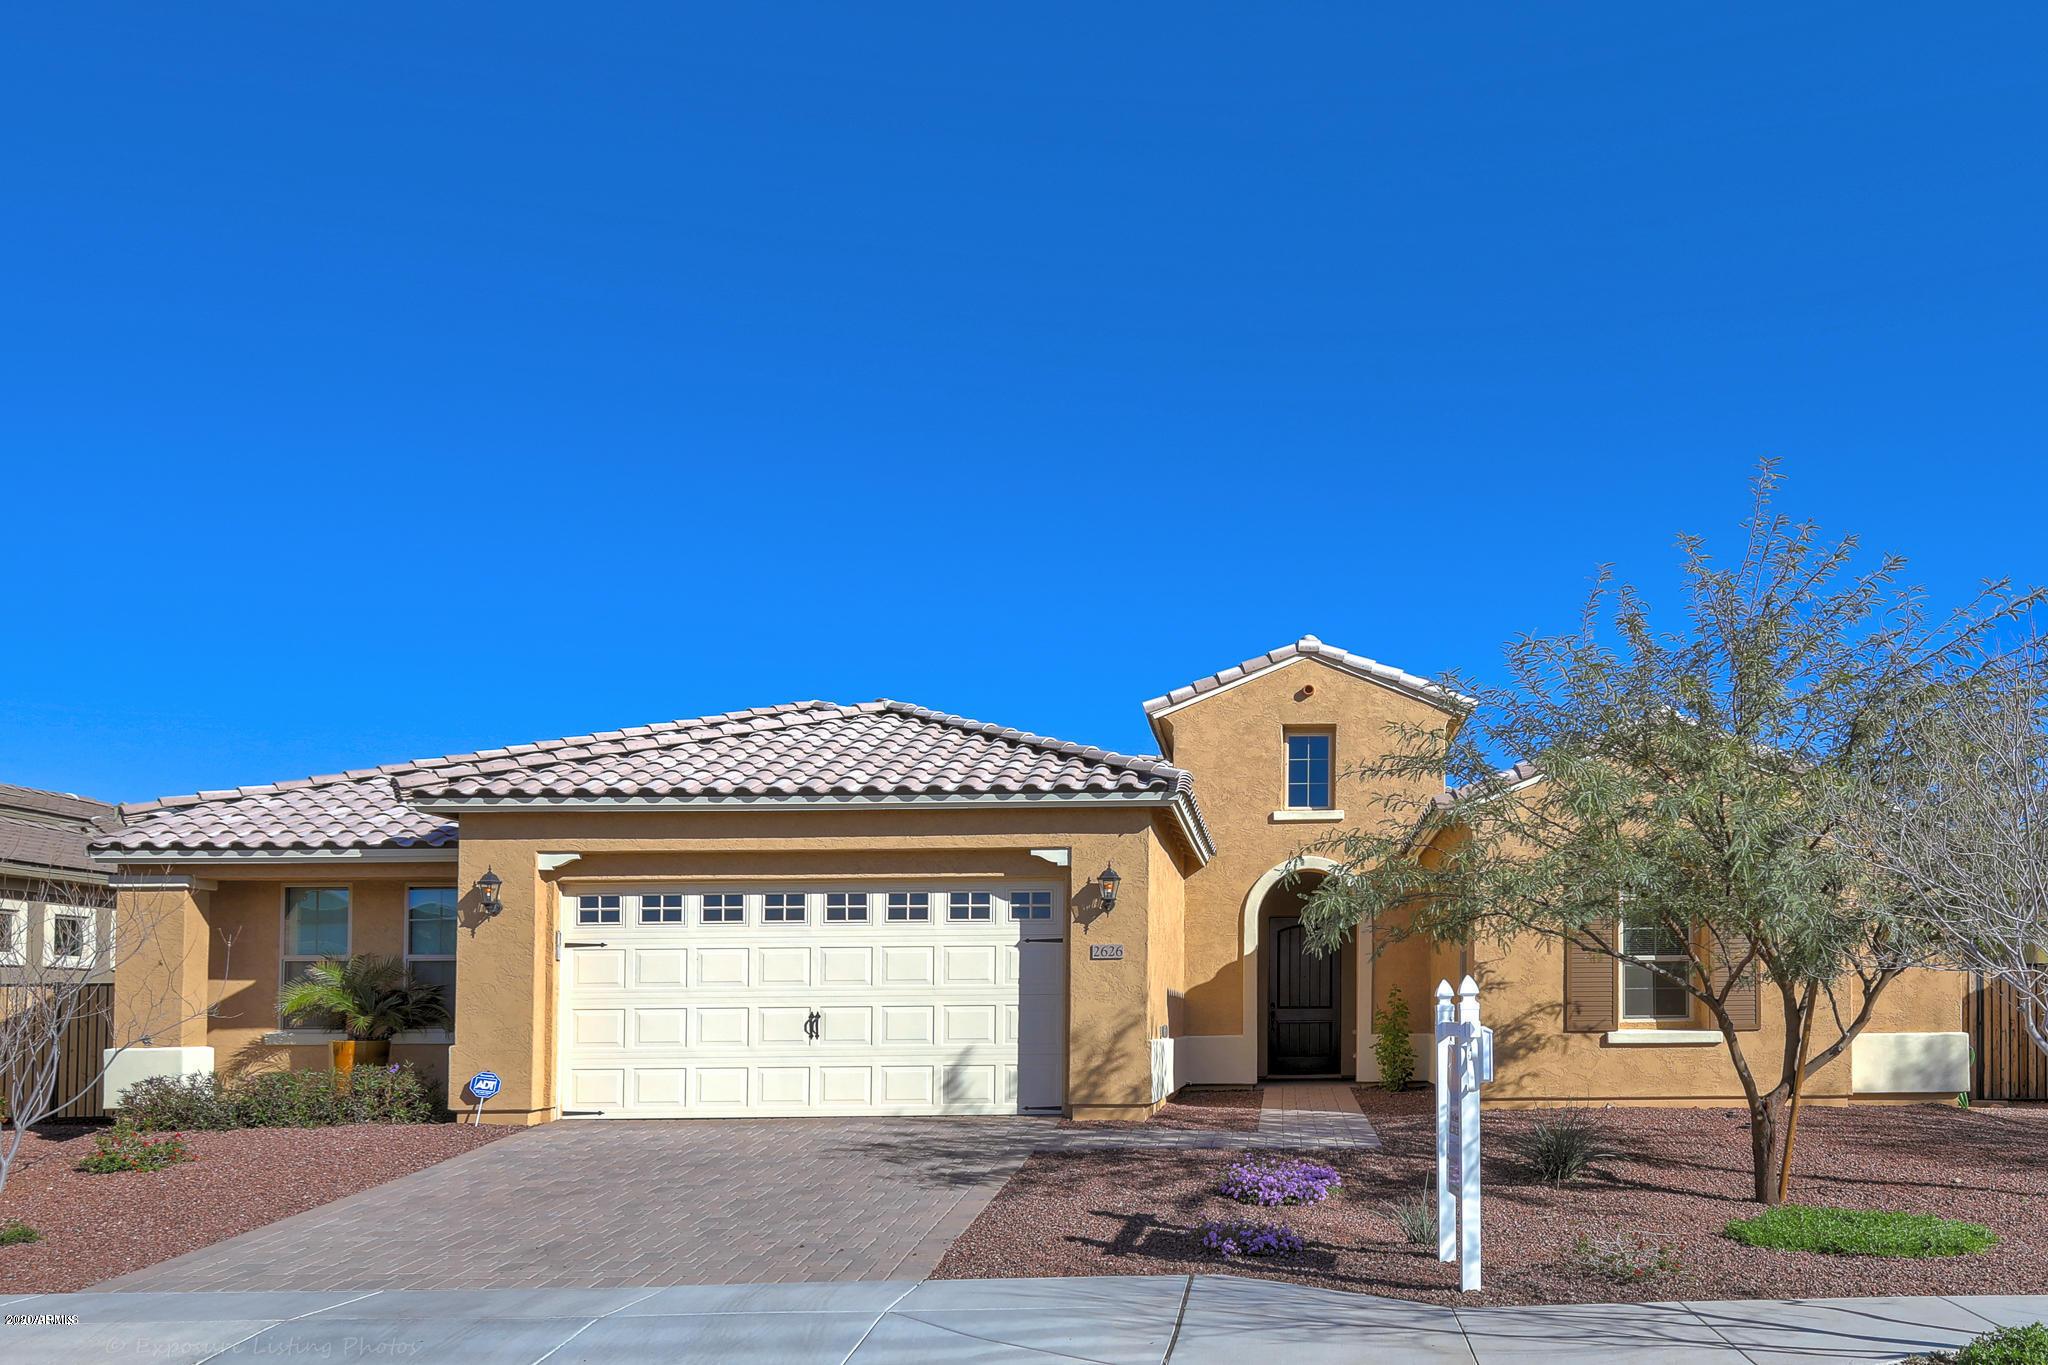 MLS 6094885 Phoenix Metro Area, Phoenix, AZ 85085 Newer Homes in Phoenix